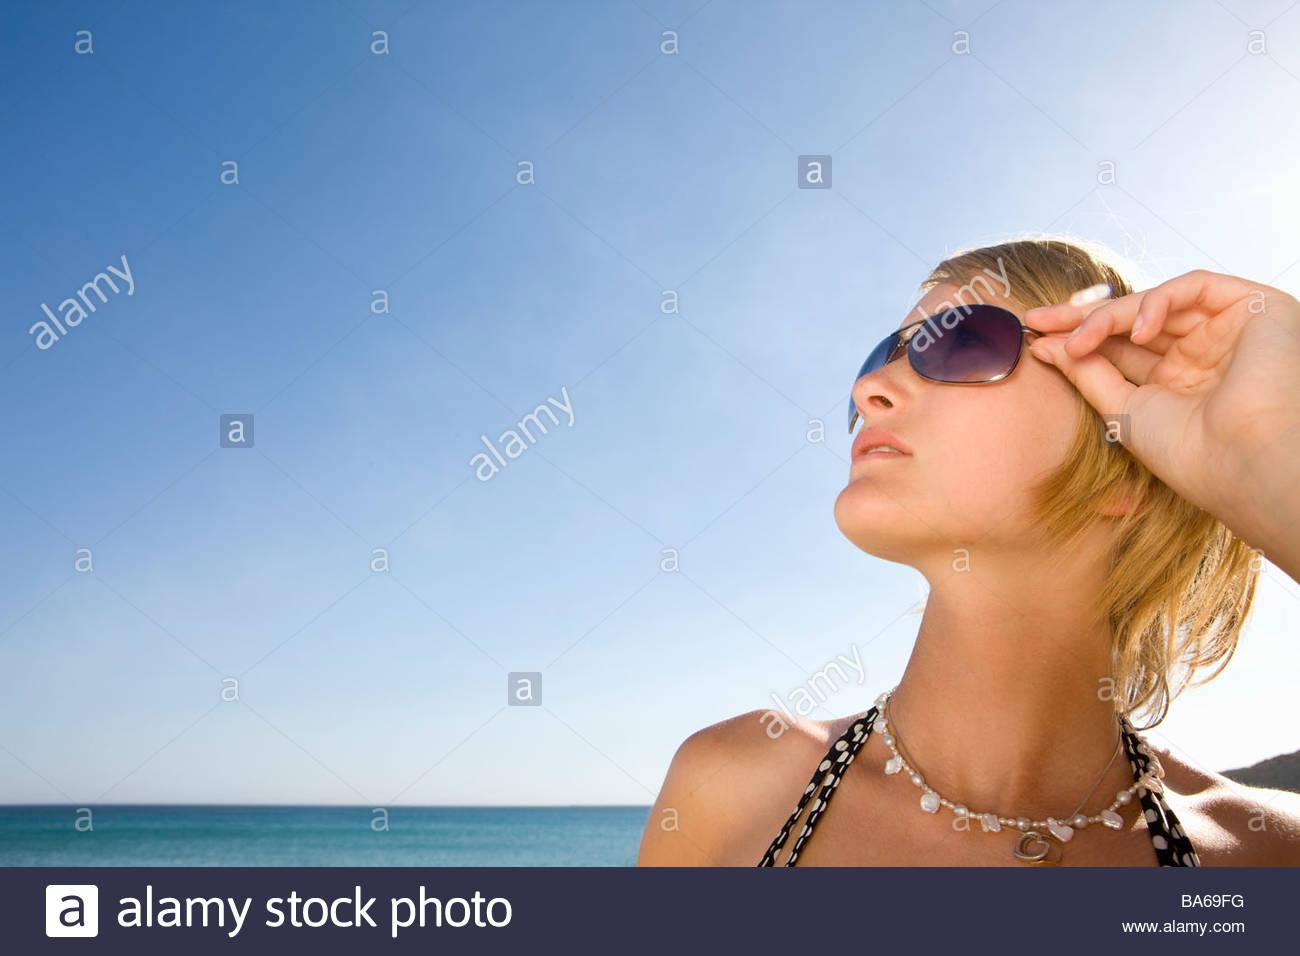 Adolescente élégant posing on beach Photo Stock